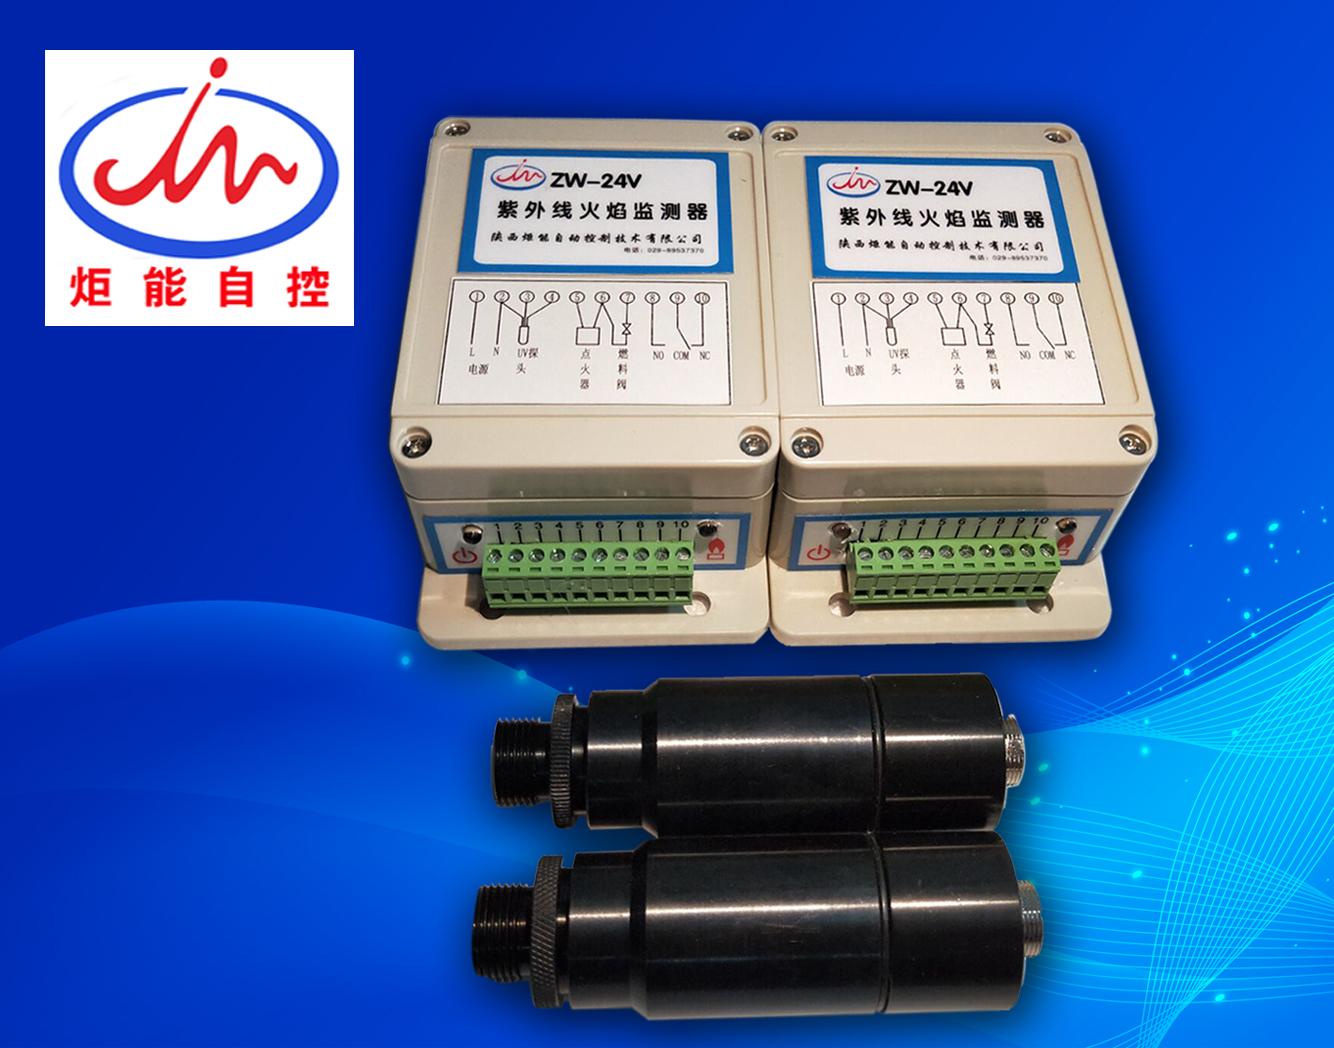 ZW-24V紫外线火焰监测器